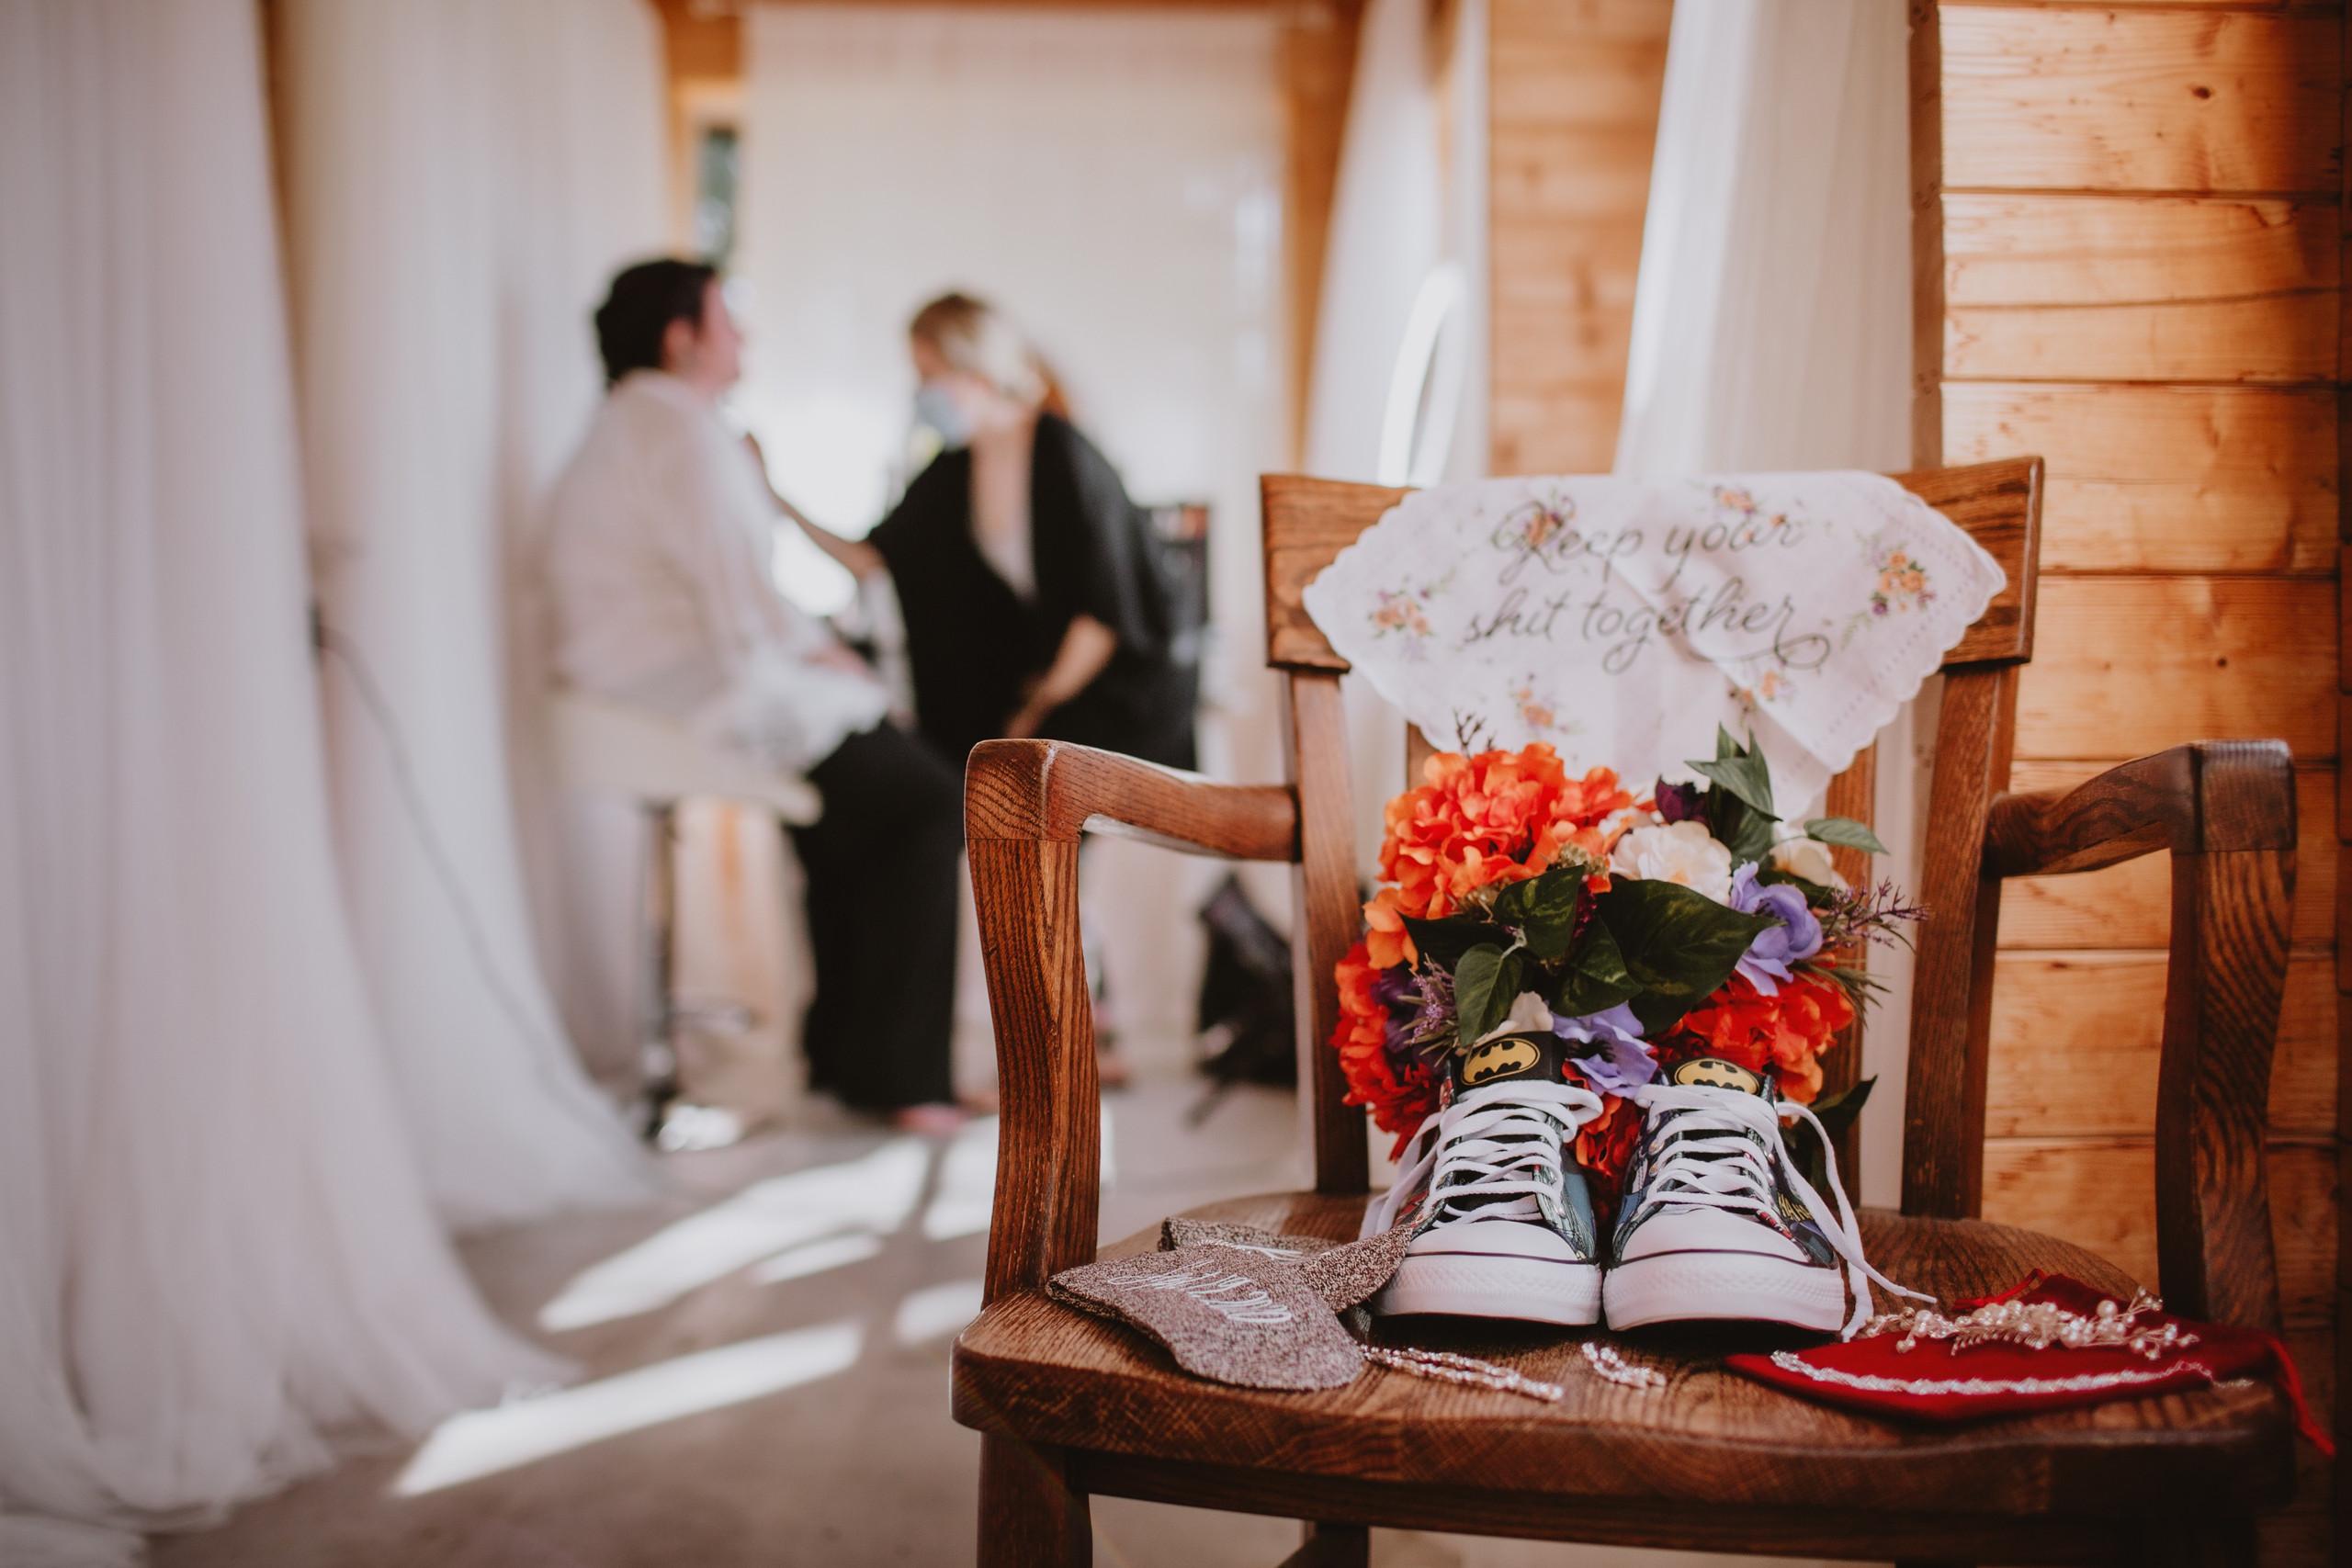 Bride gets ready, wedding details displayed.